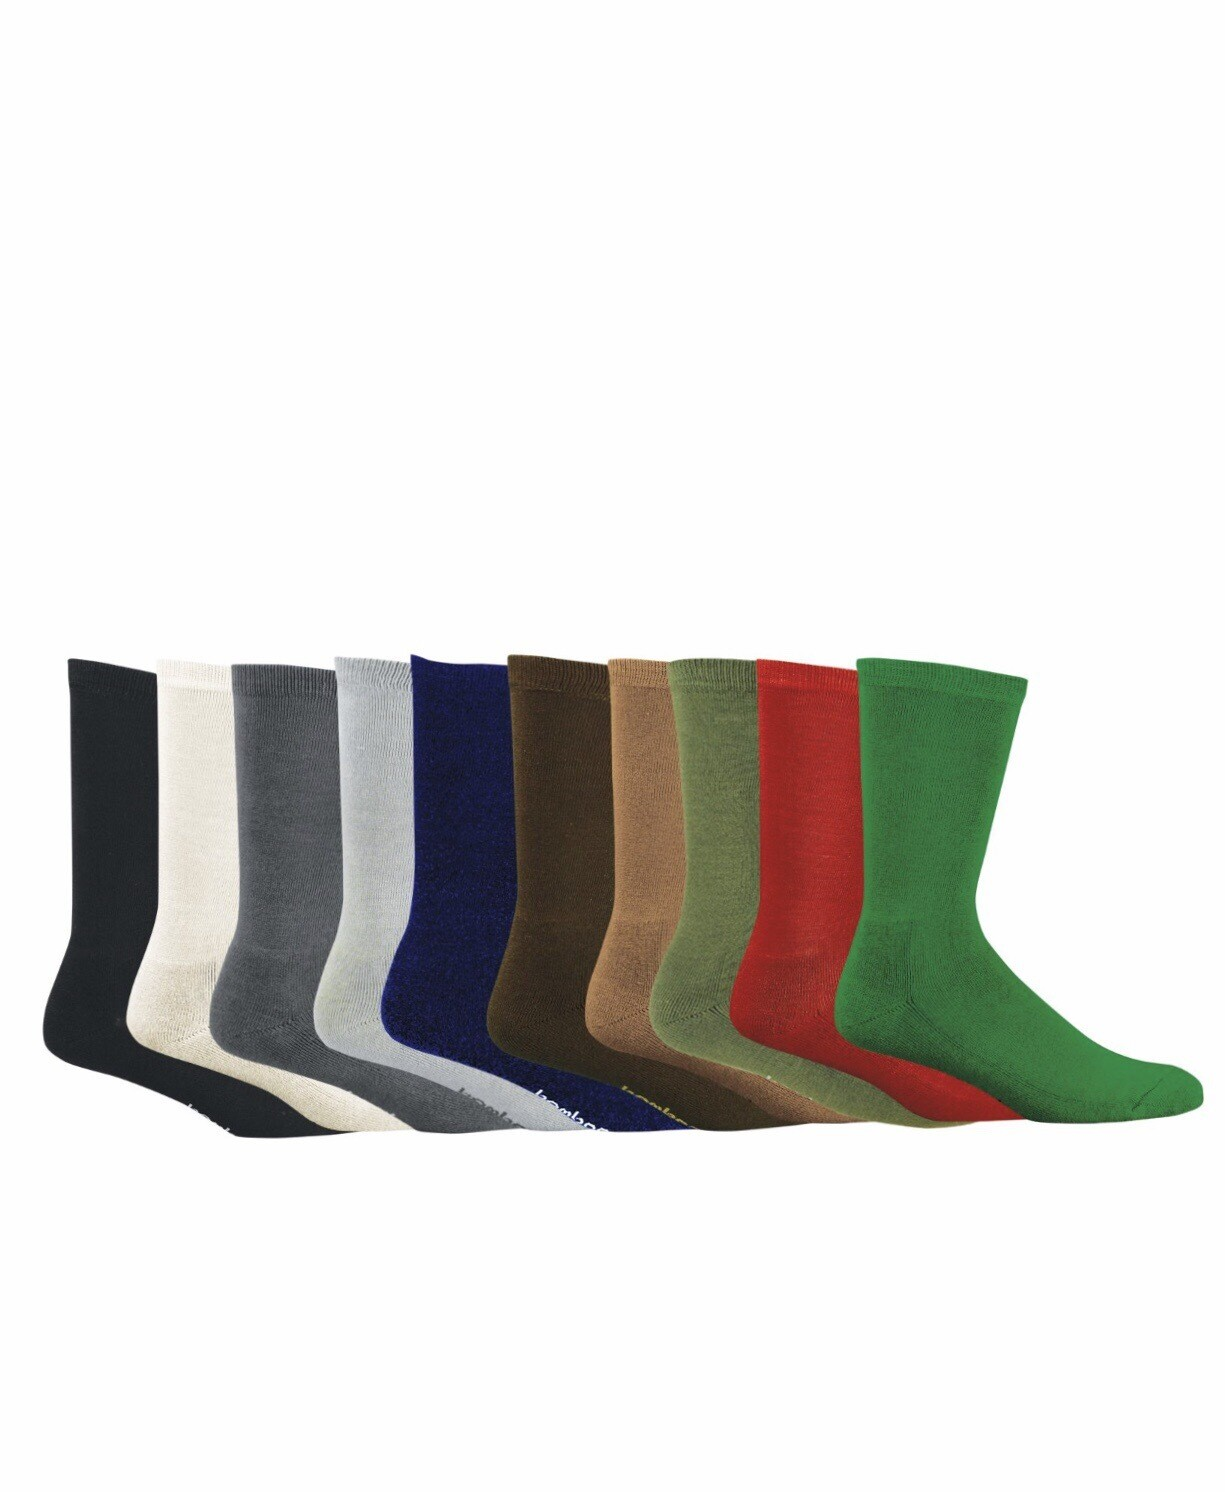 Bamboo Comfort Socks